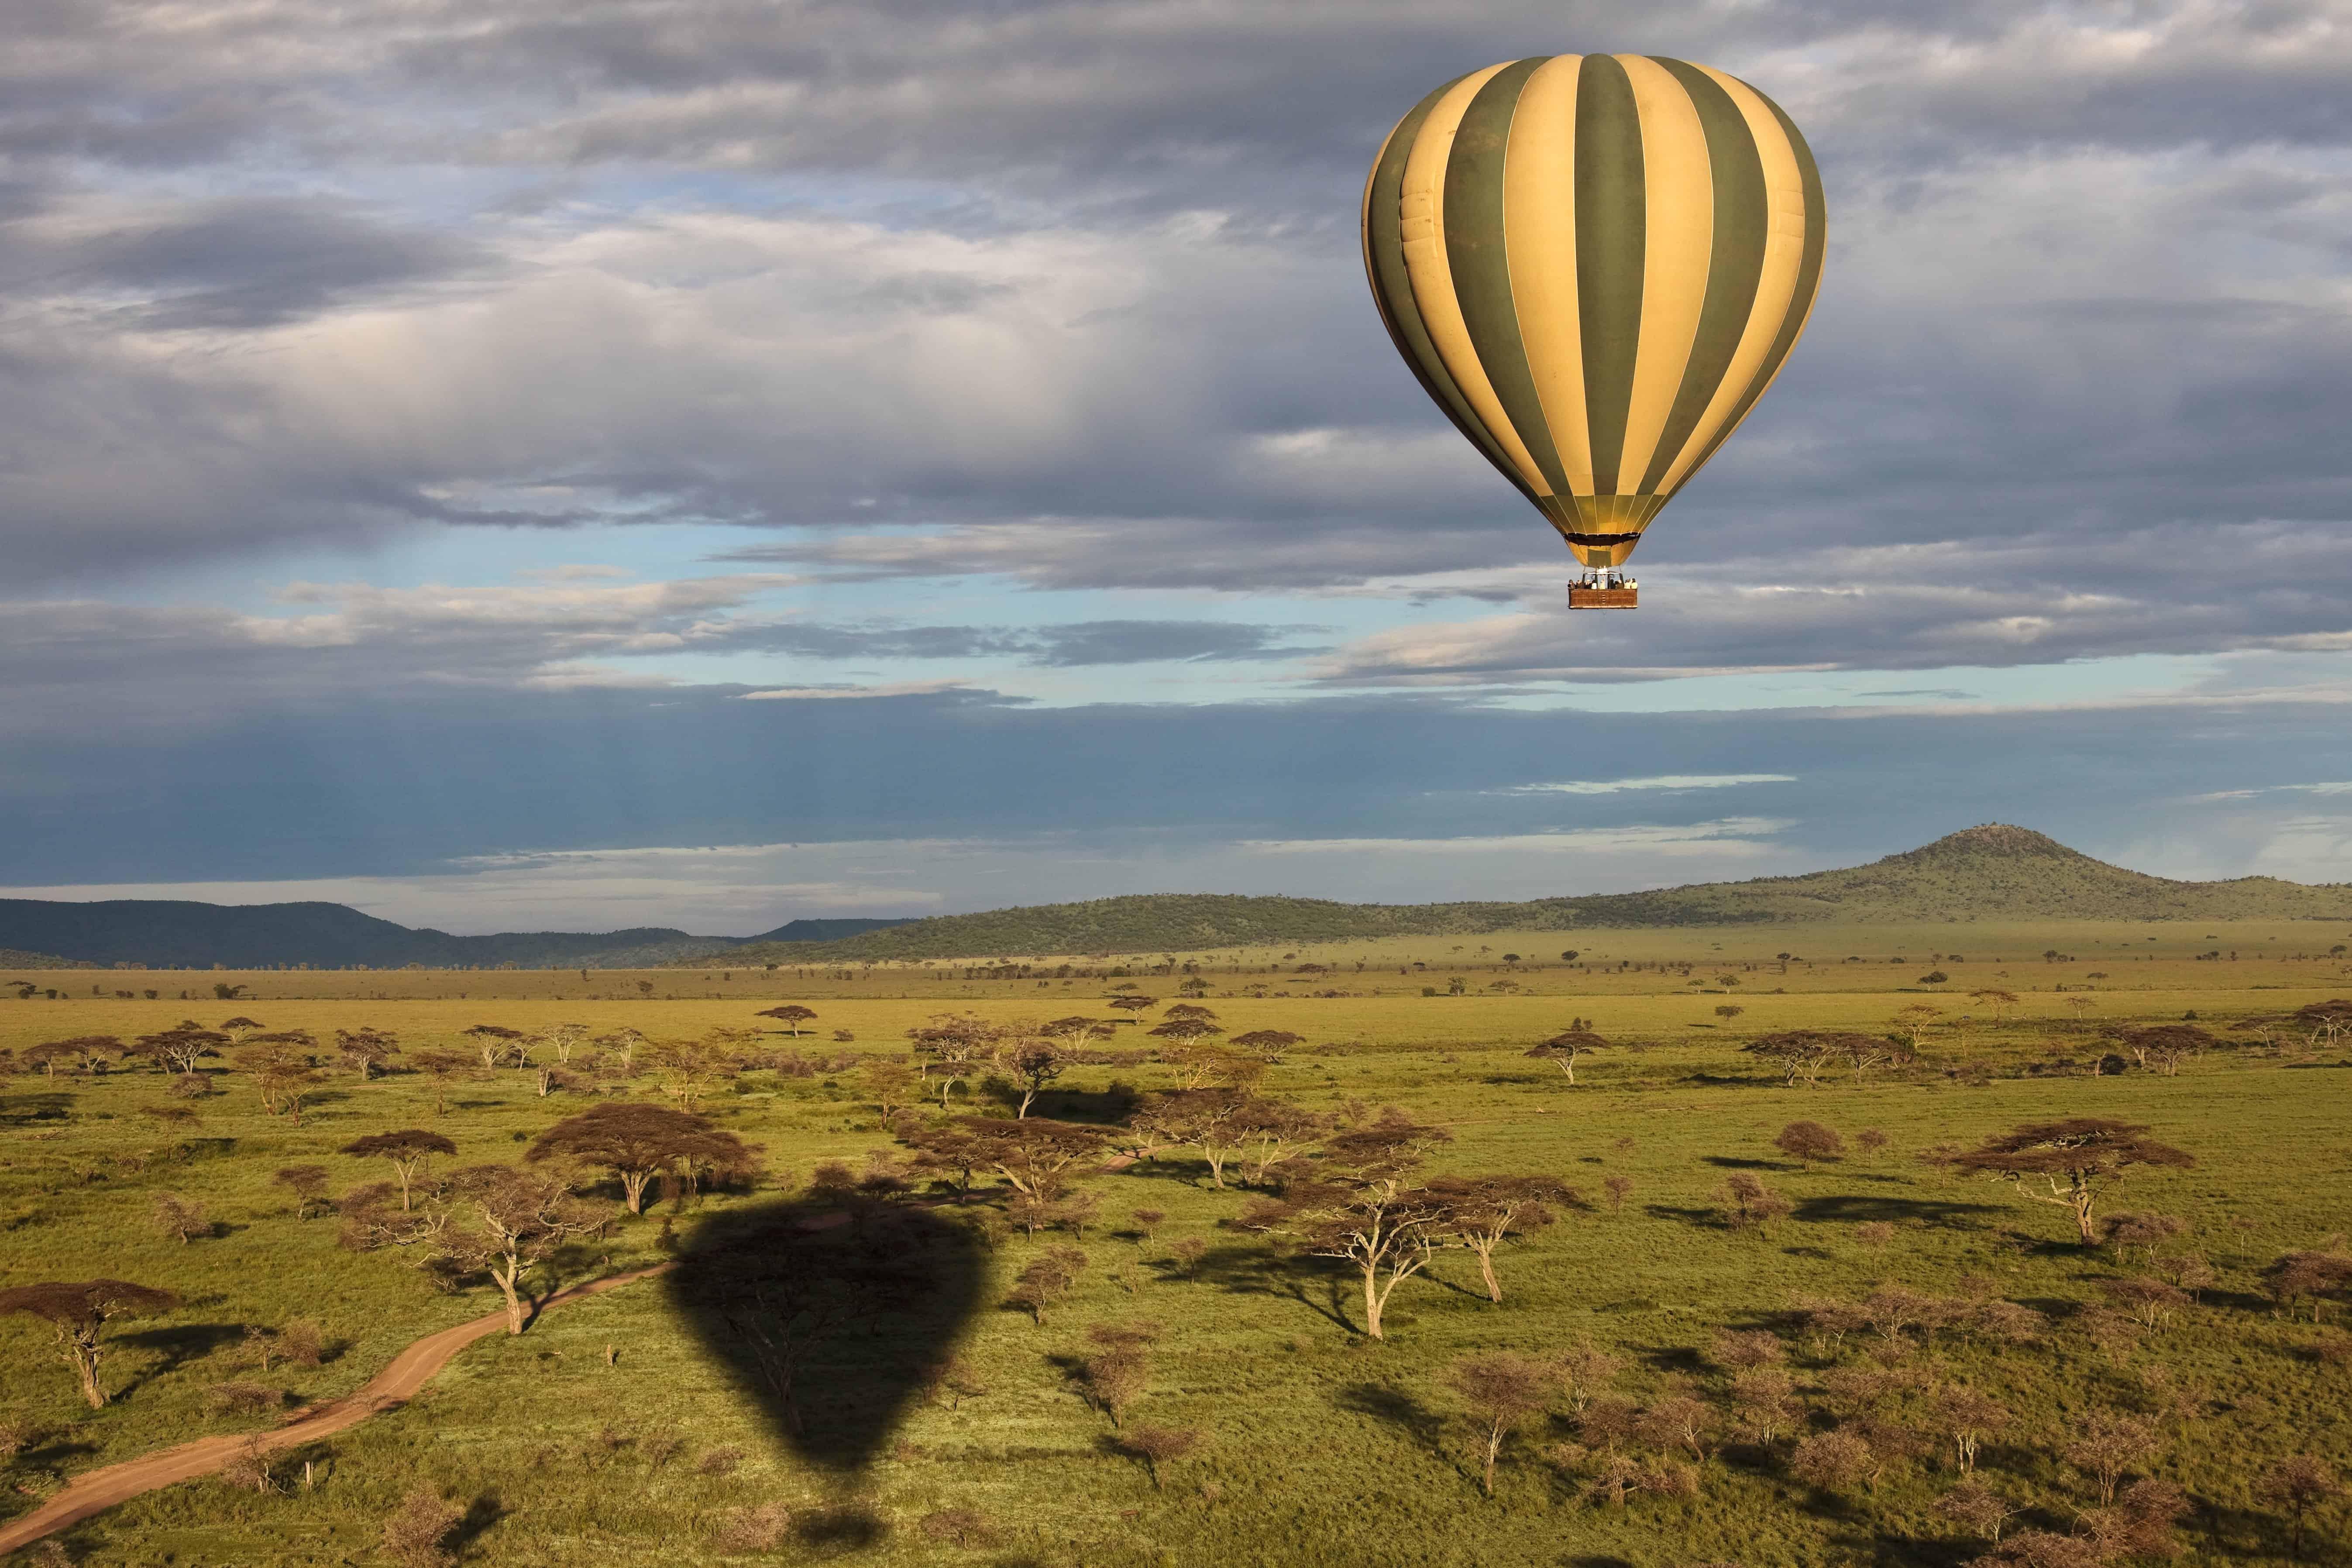 Hot air balloon over the Serengeti